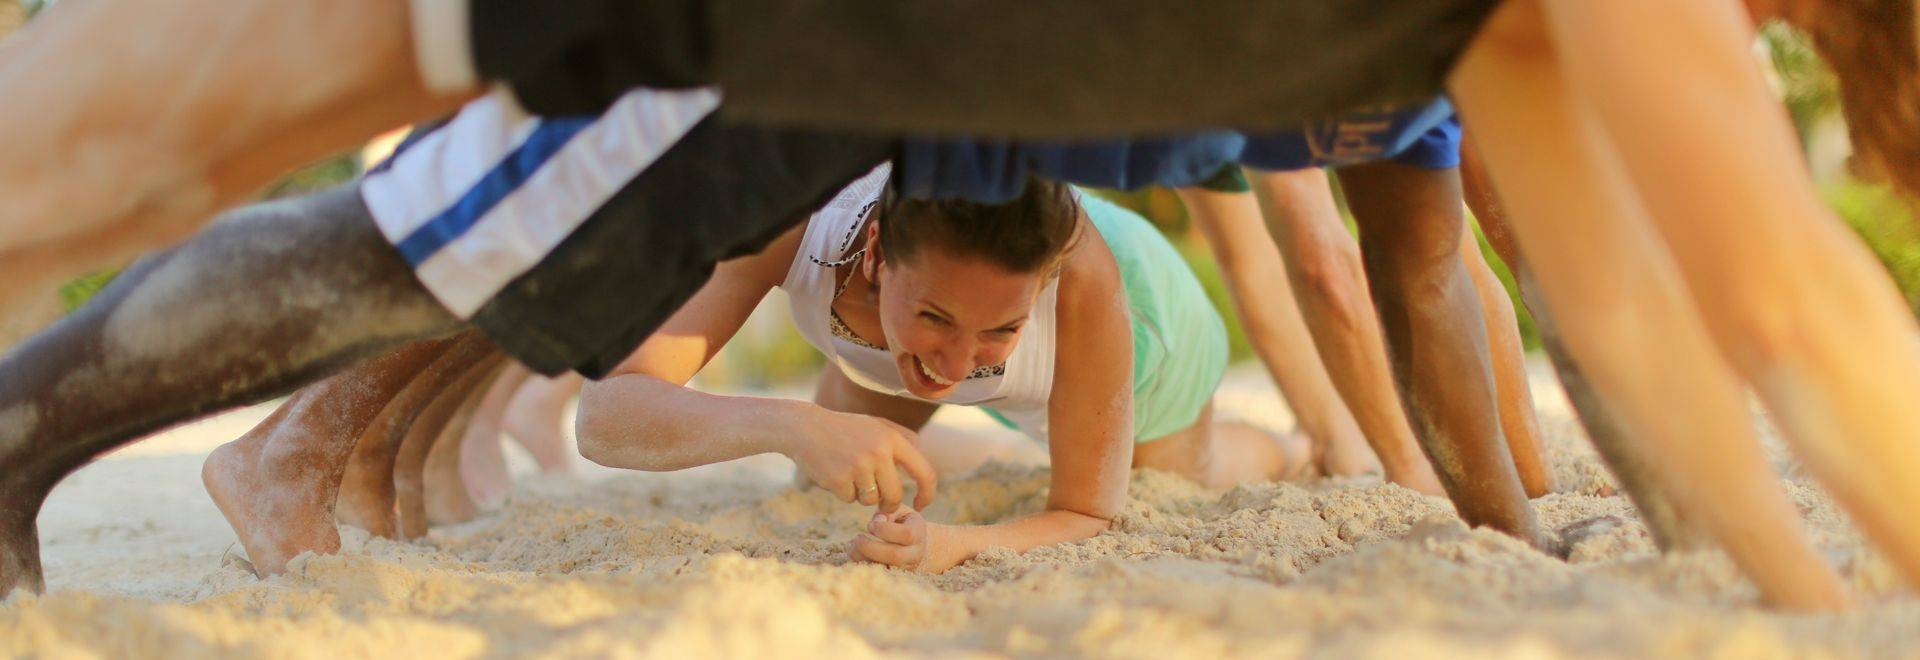 Zansibar-sandcrawling.jpg